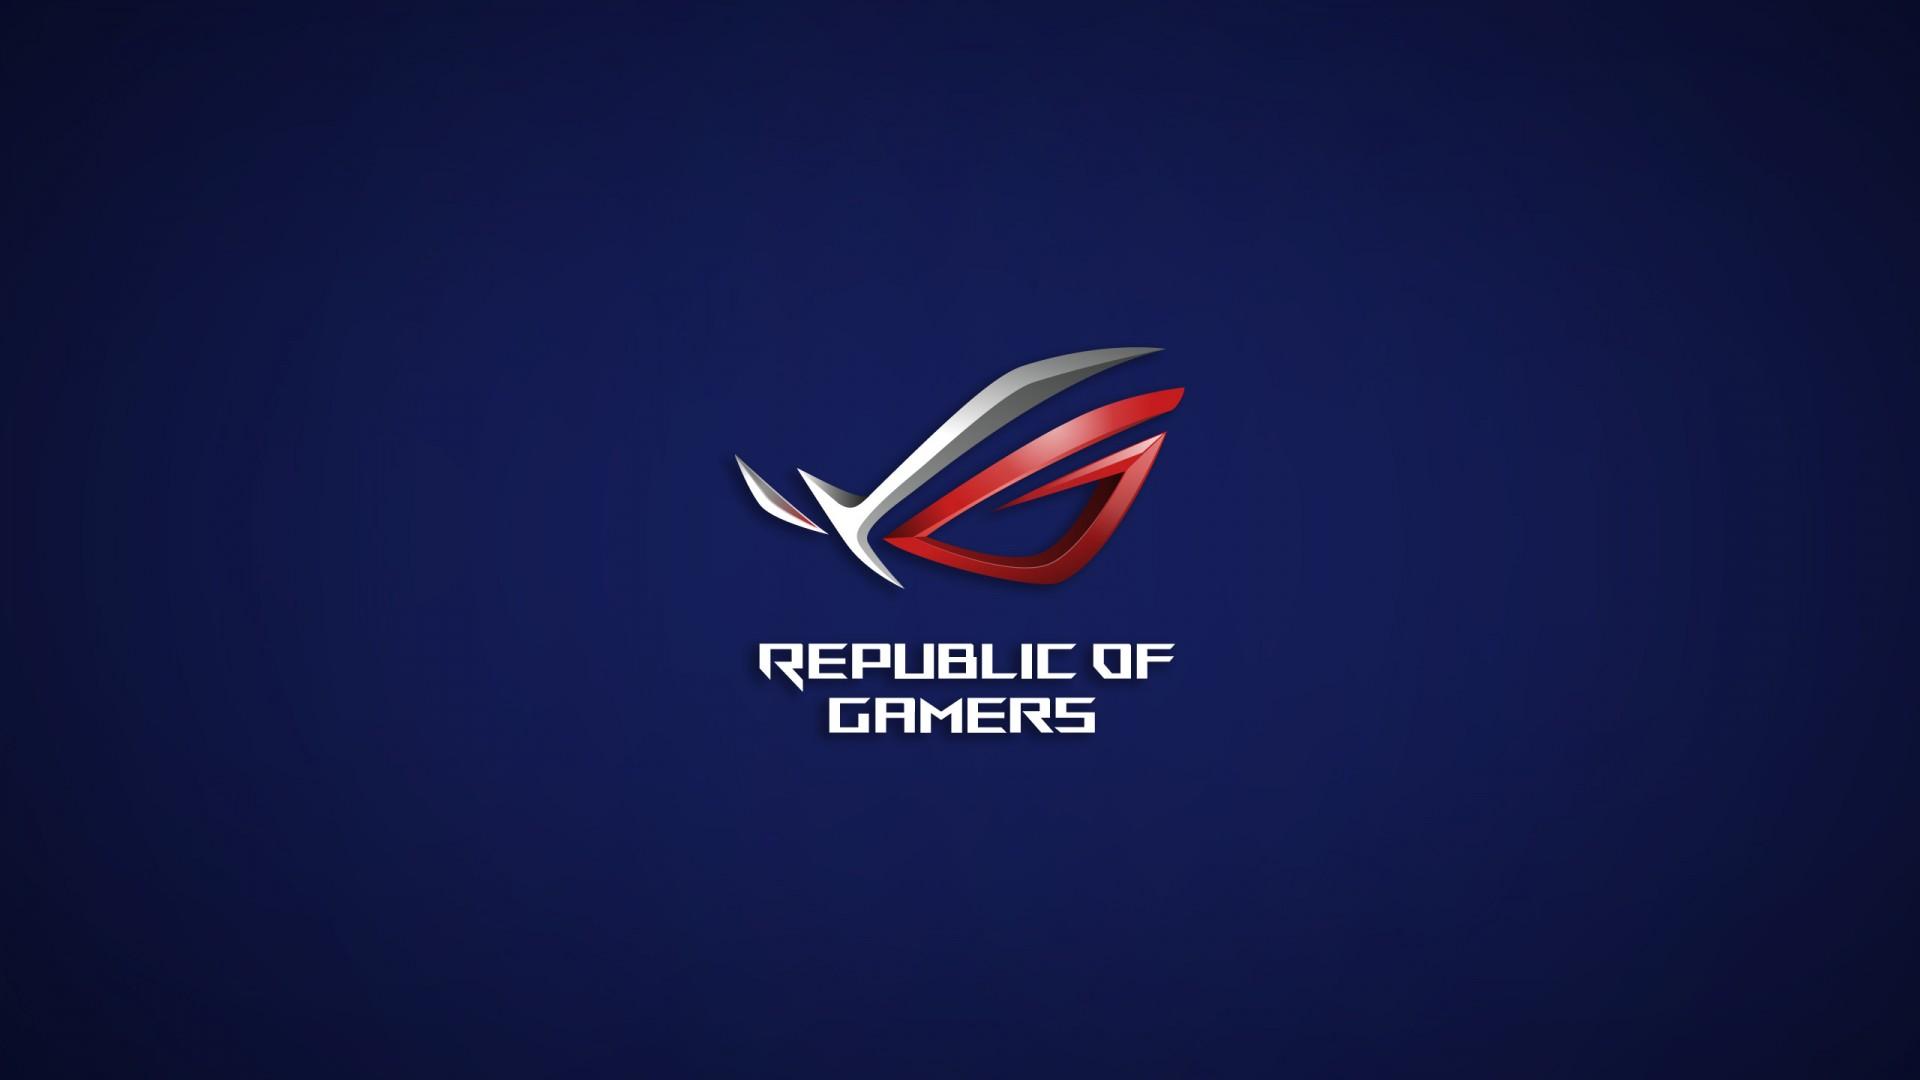 Iphone X Liquid Wallpaper Download Rog Asus Republic Of Gamers Wallpapers Hd Wallpapers